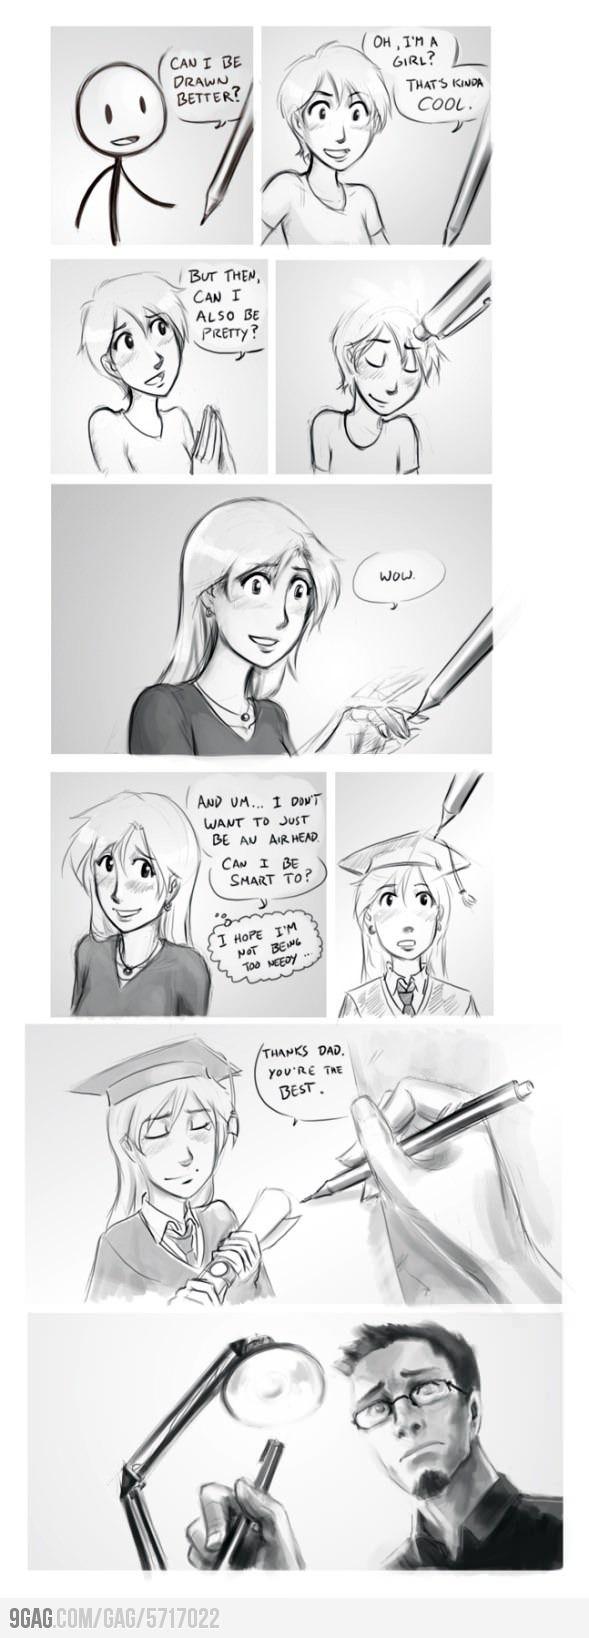 Story of stick girl artwork pinterest arte dibujos and cómics